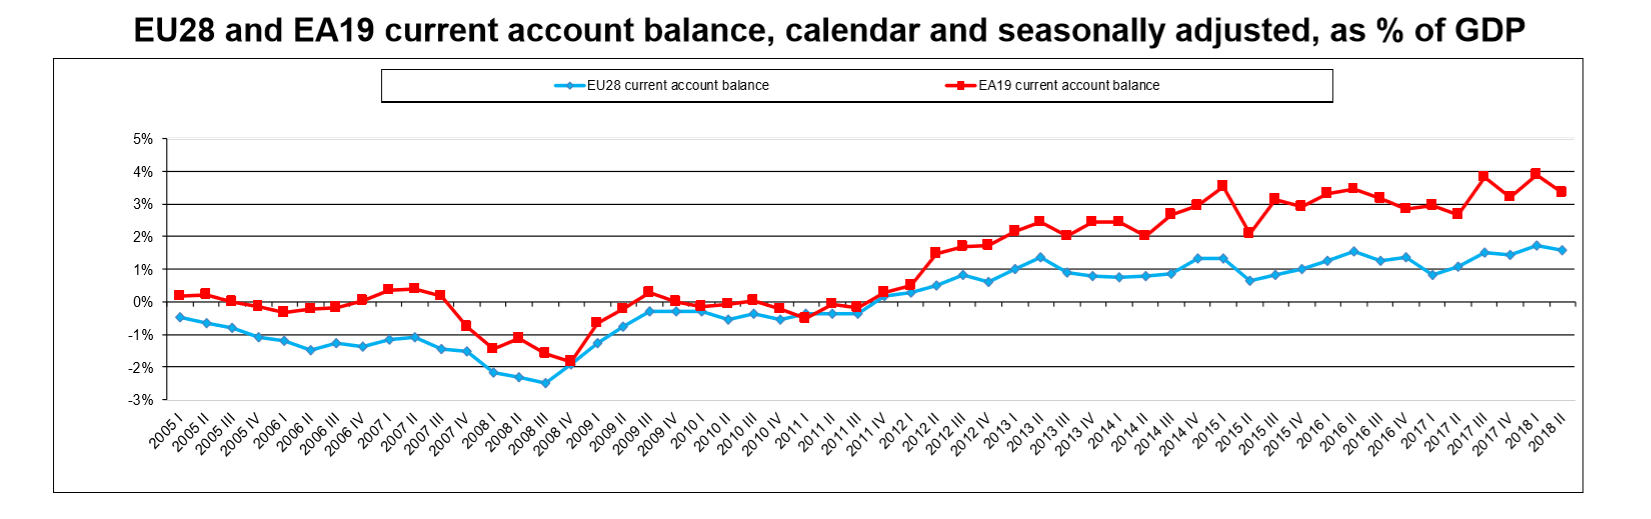 EU current account balance percentage of GDP Q2 2018